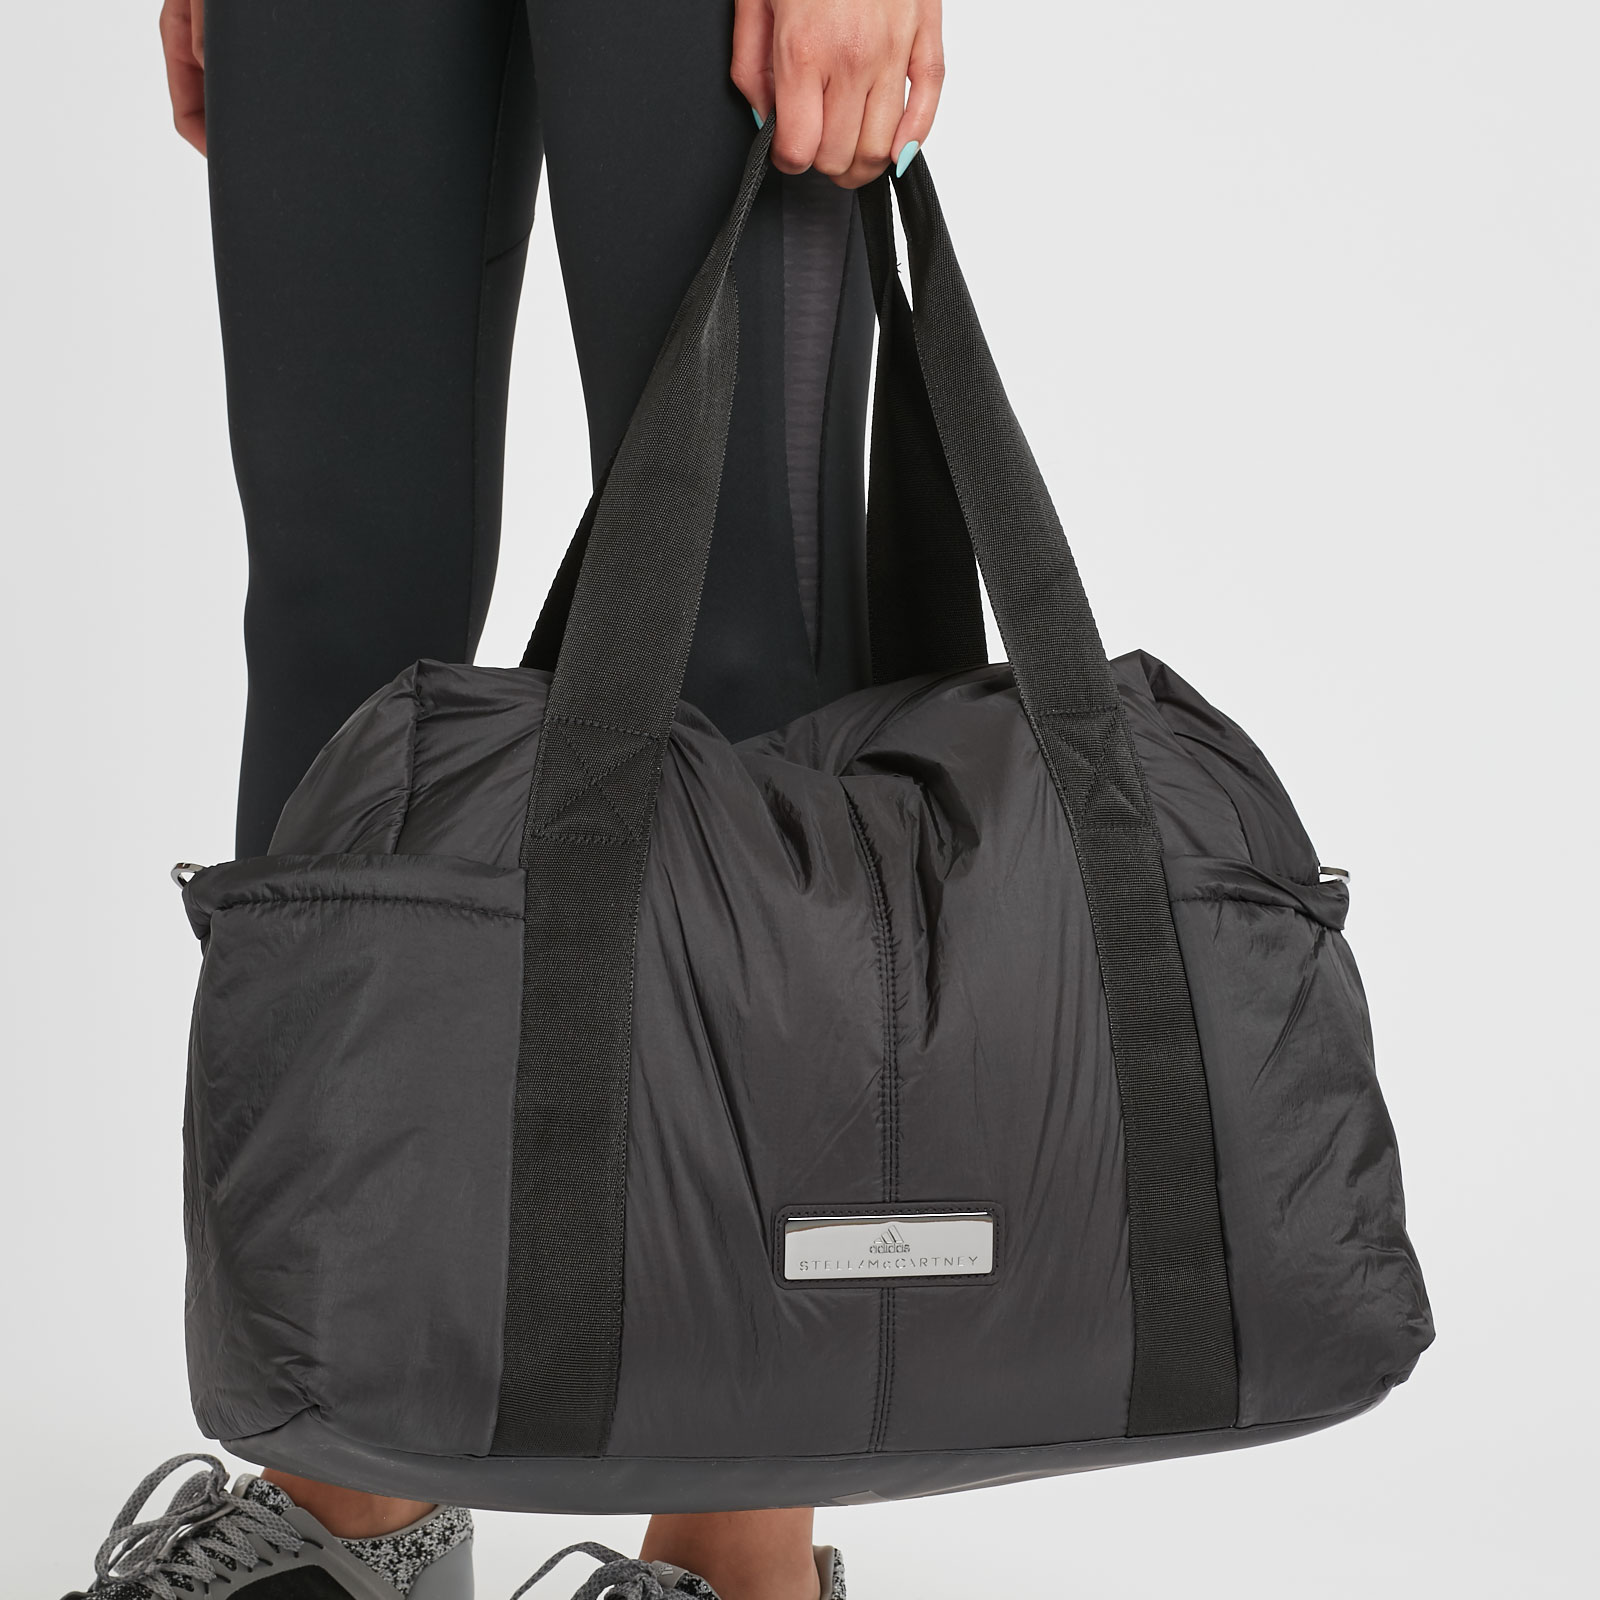 newest 0734f d1380 adidas Shipshape Bag M - Cd1290 - Sneakersnstuff   sneakers   streetwear  online since 1999